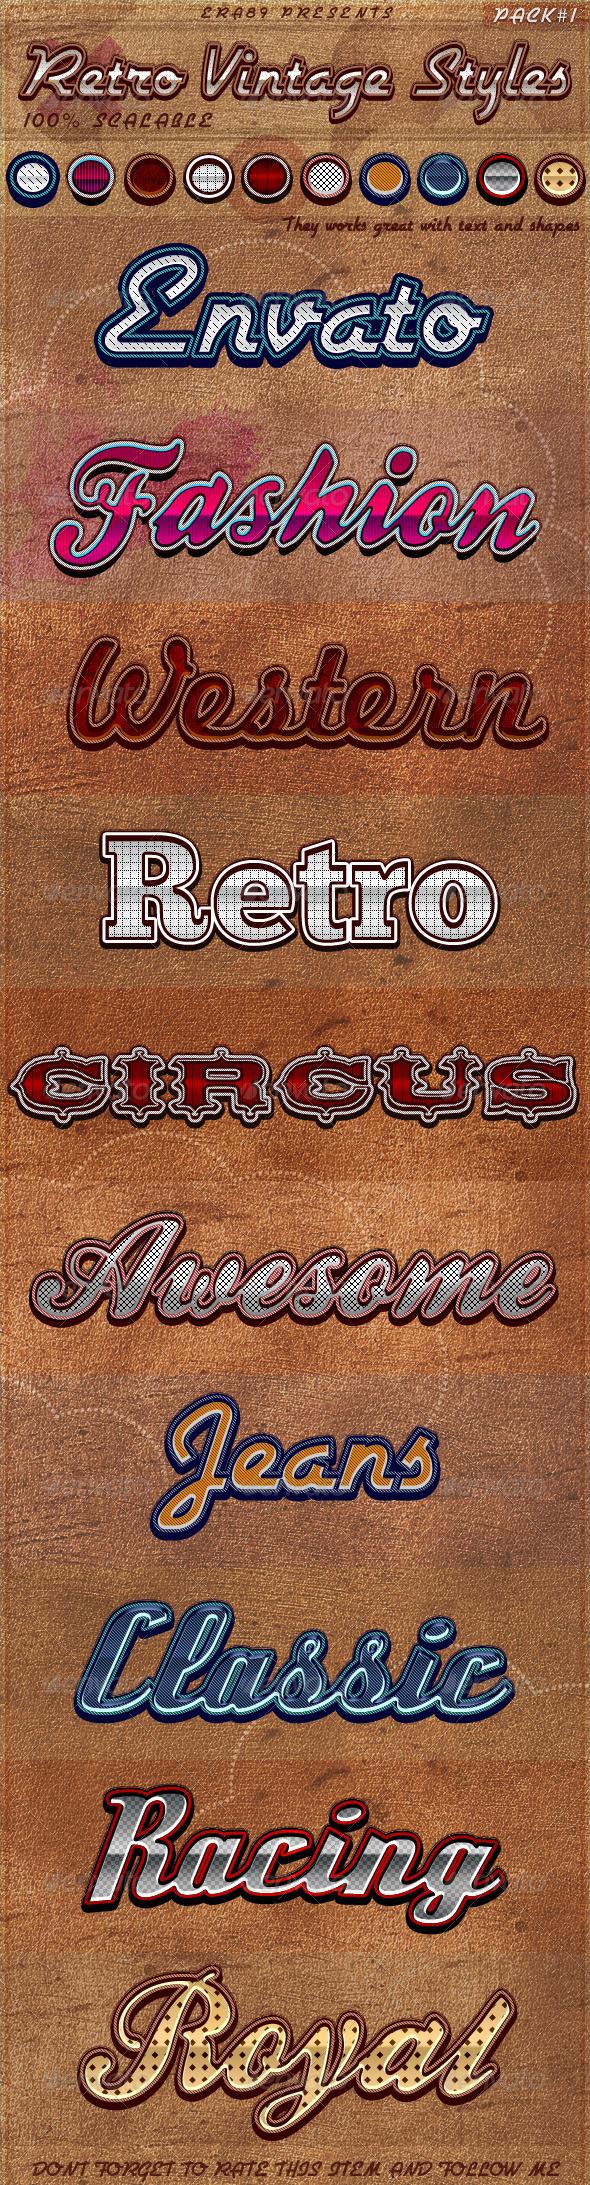 GraphicRiver Retro Vintage Styles 1854525